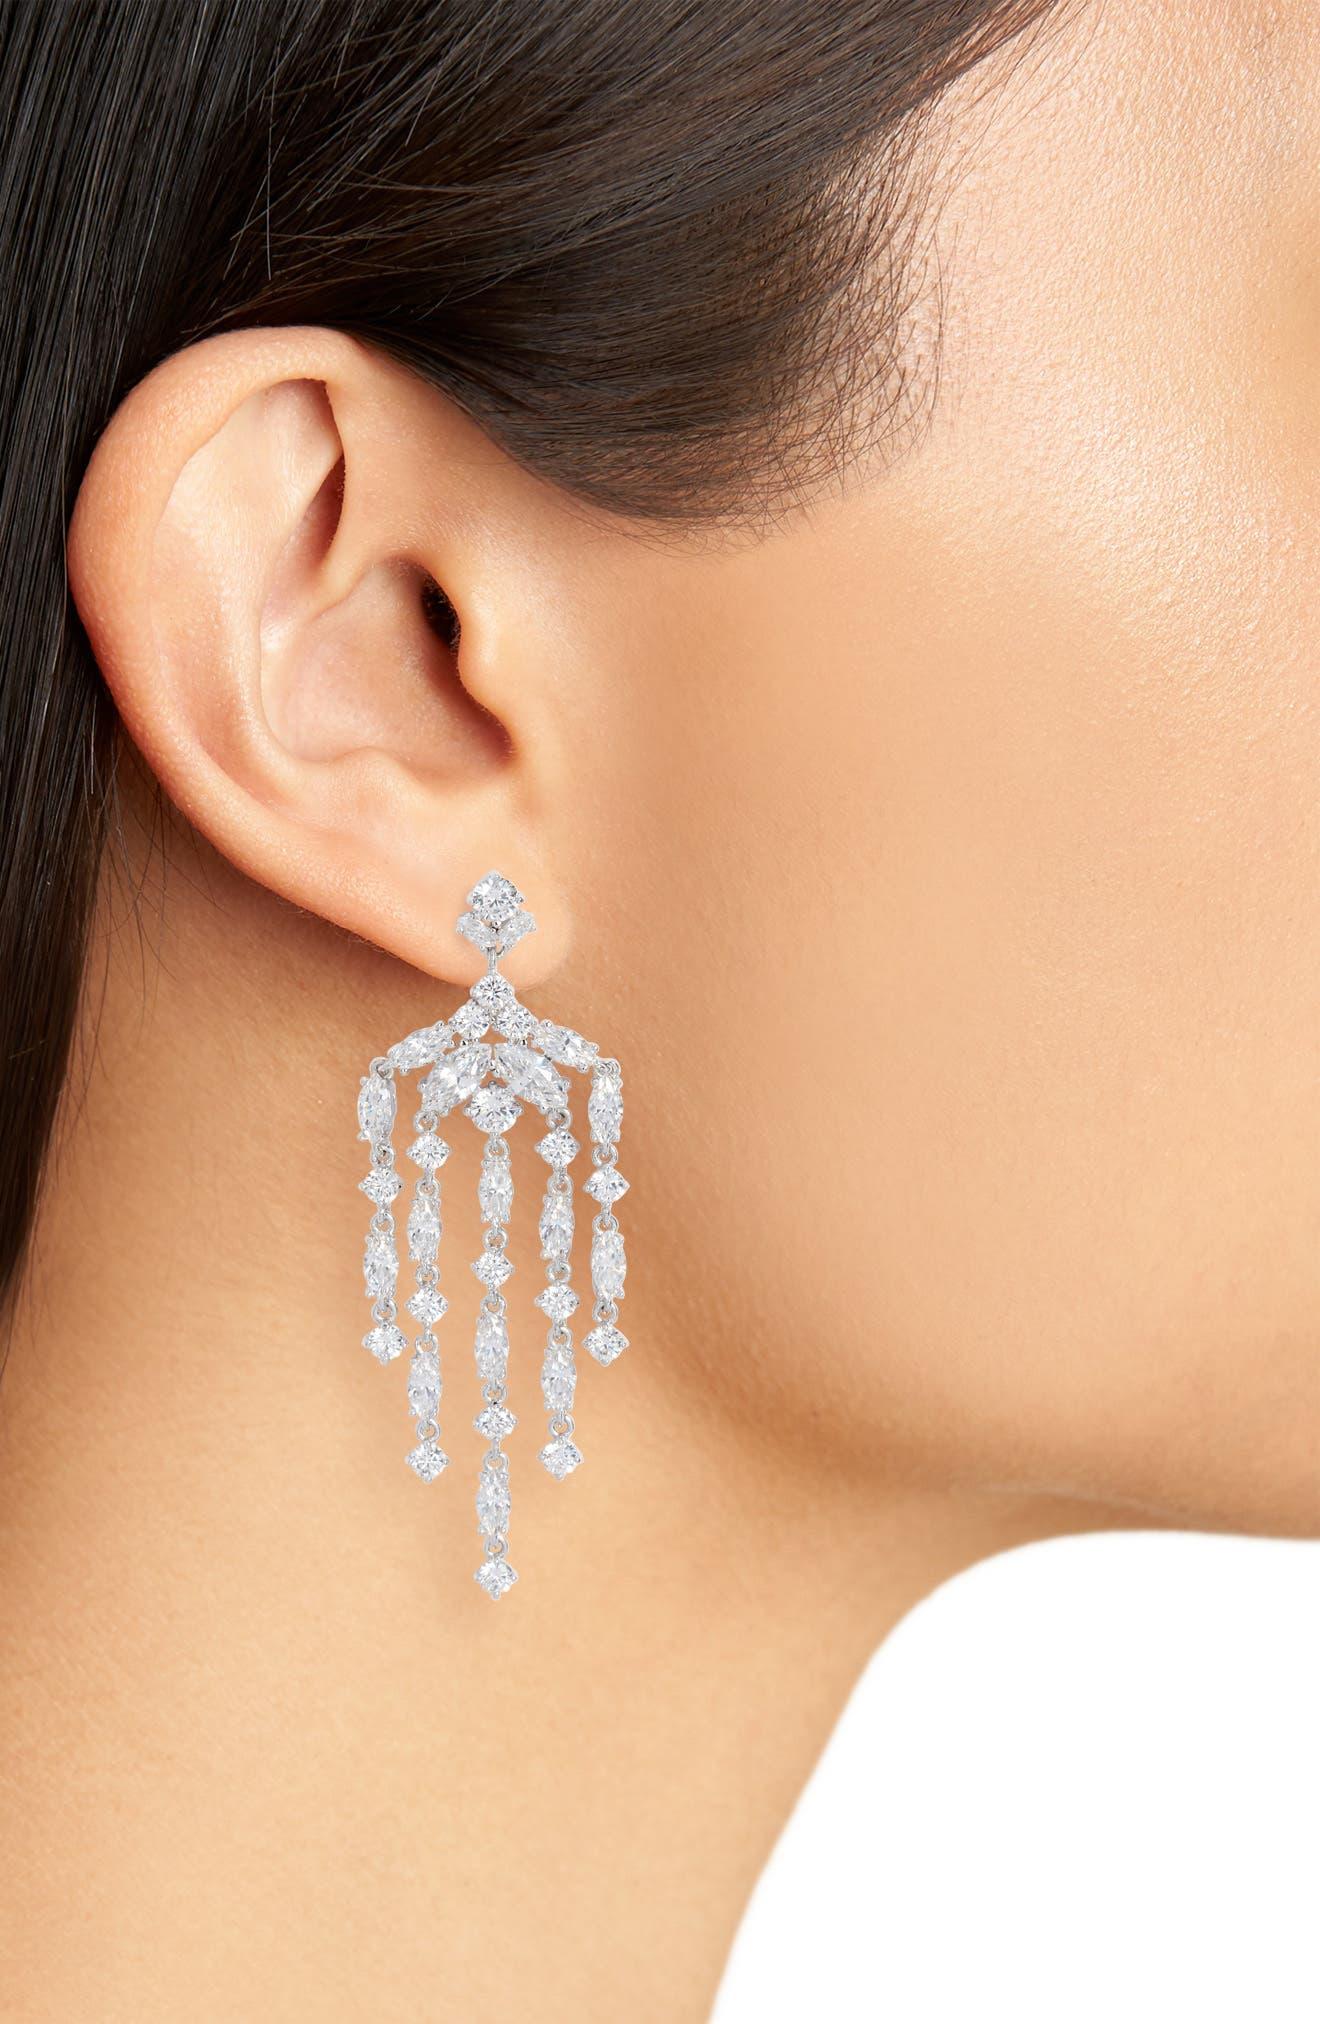 Waterfall Chandelier Earrings,                             Alternate thumbnail 2, color,                             CLEAR- SILVER